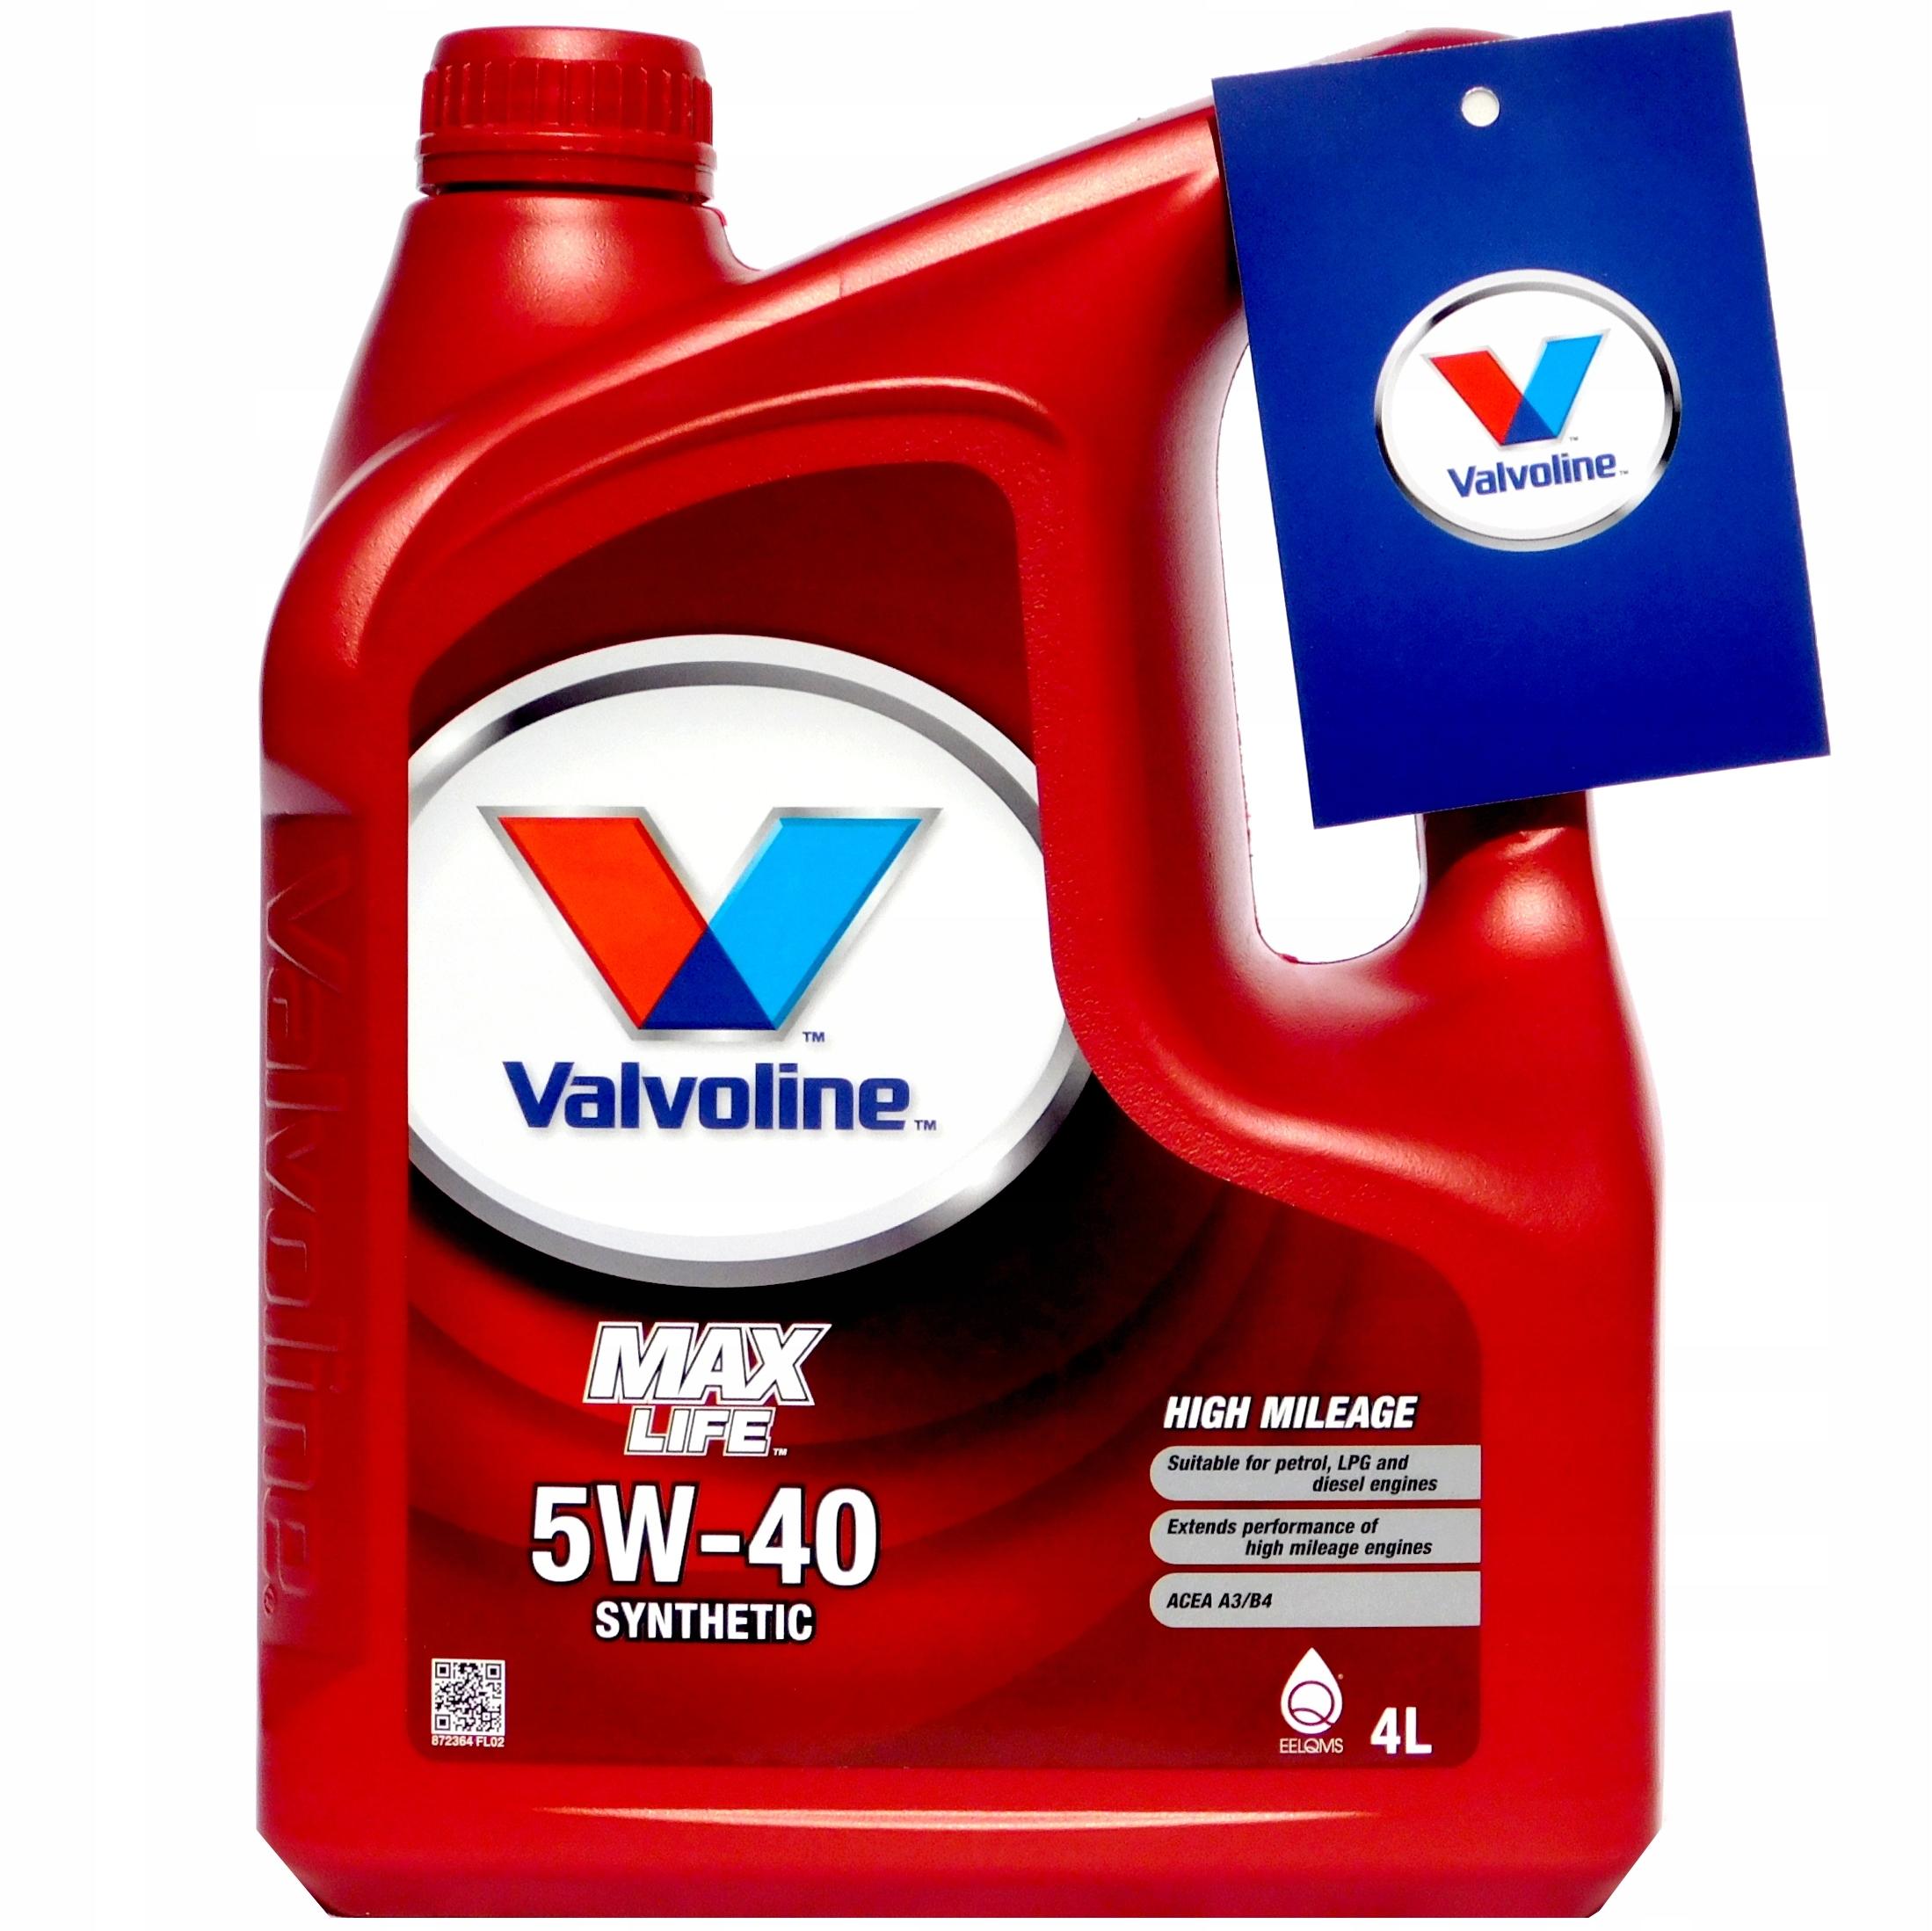 VALVOLINE MaxLife SYNTHETIC 5W40 4L ORIGINAL NEW